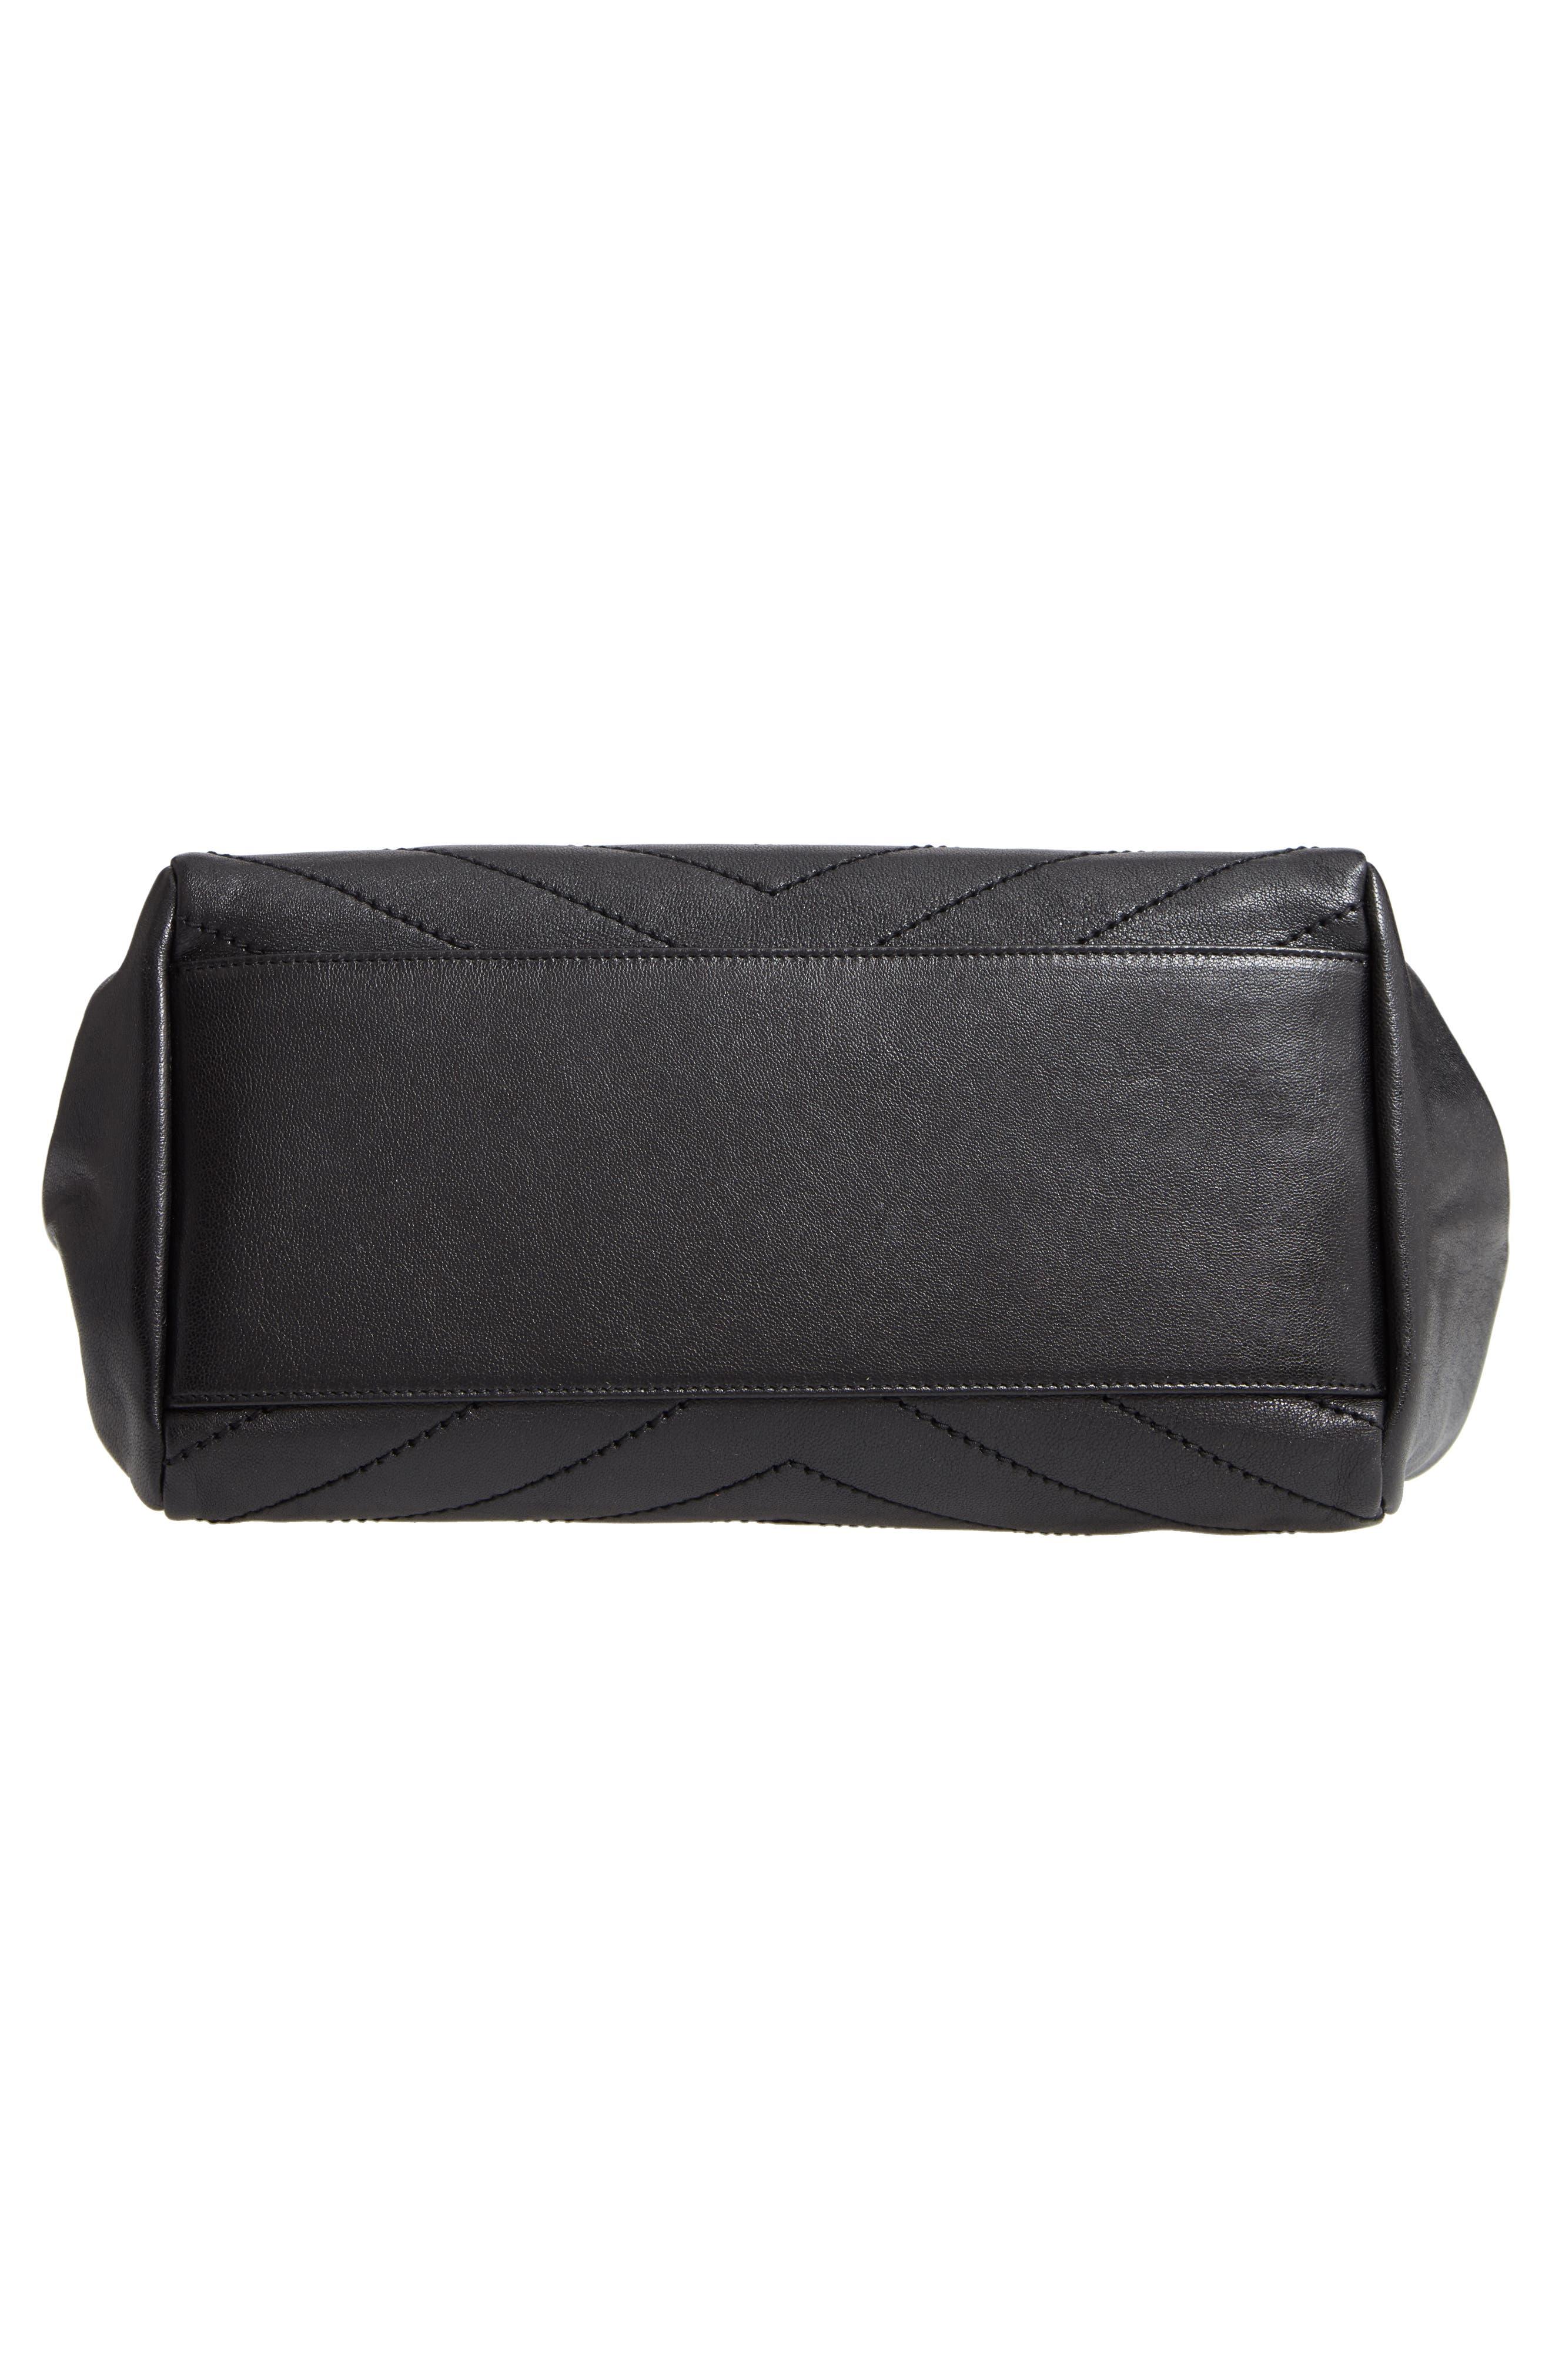 Nolita Large Leather Shoulder Bag,                             Alternate thumbnail 6, color,                             NOIR